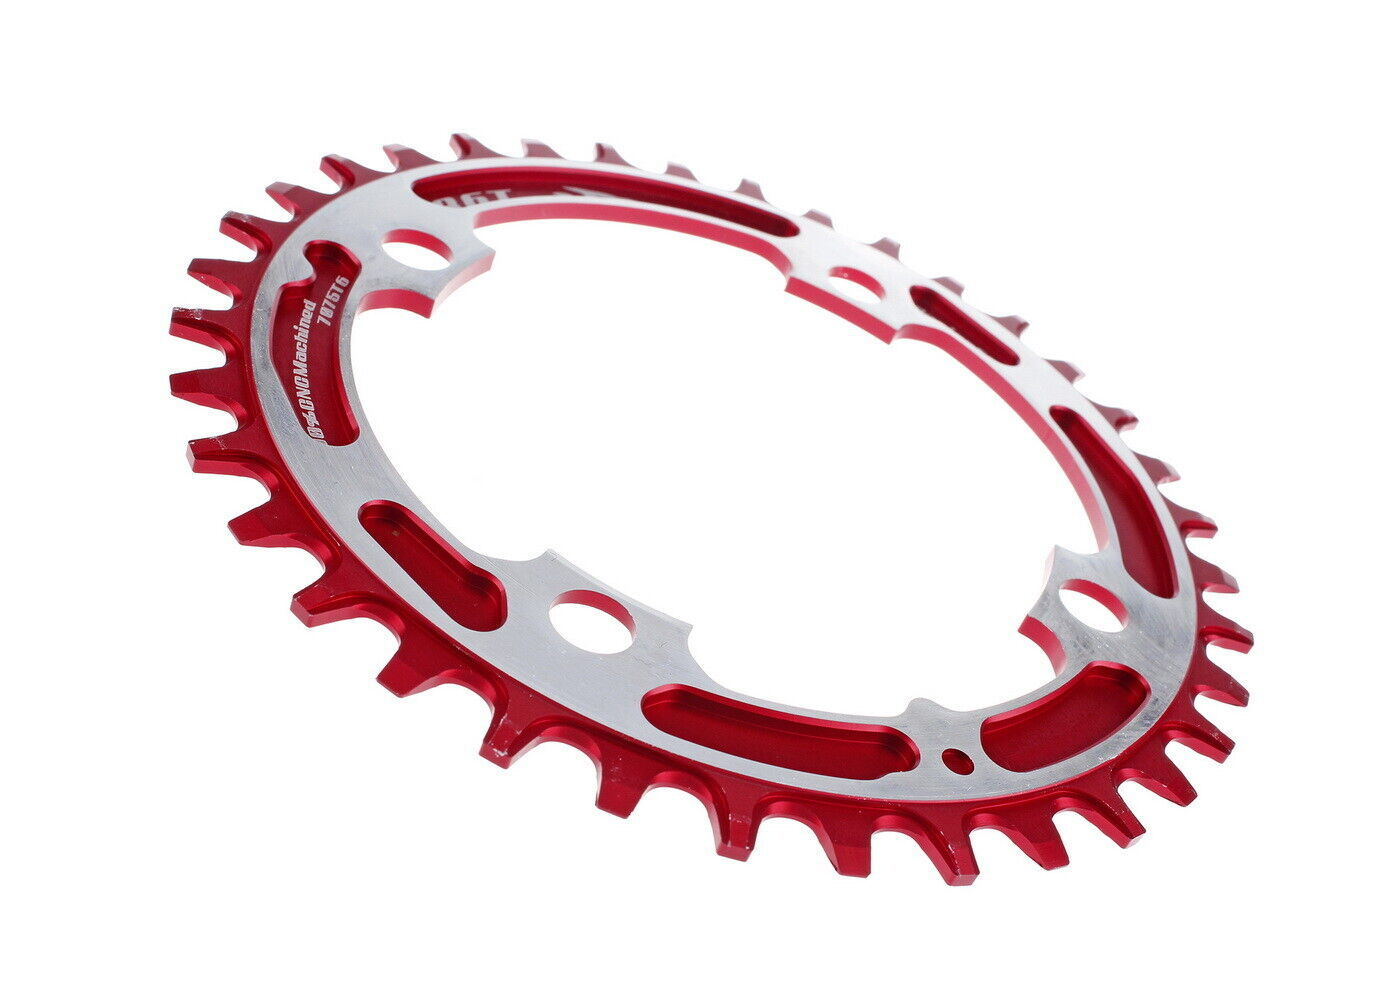 Aerozine Xone Mountain Cycling Bike Single Chainring for Shimano Sram 36T Red